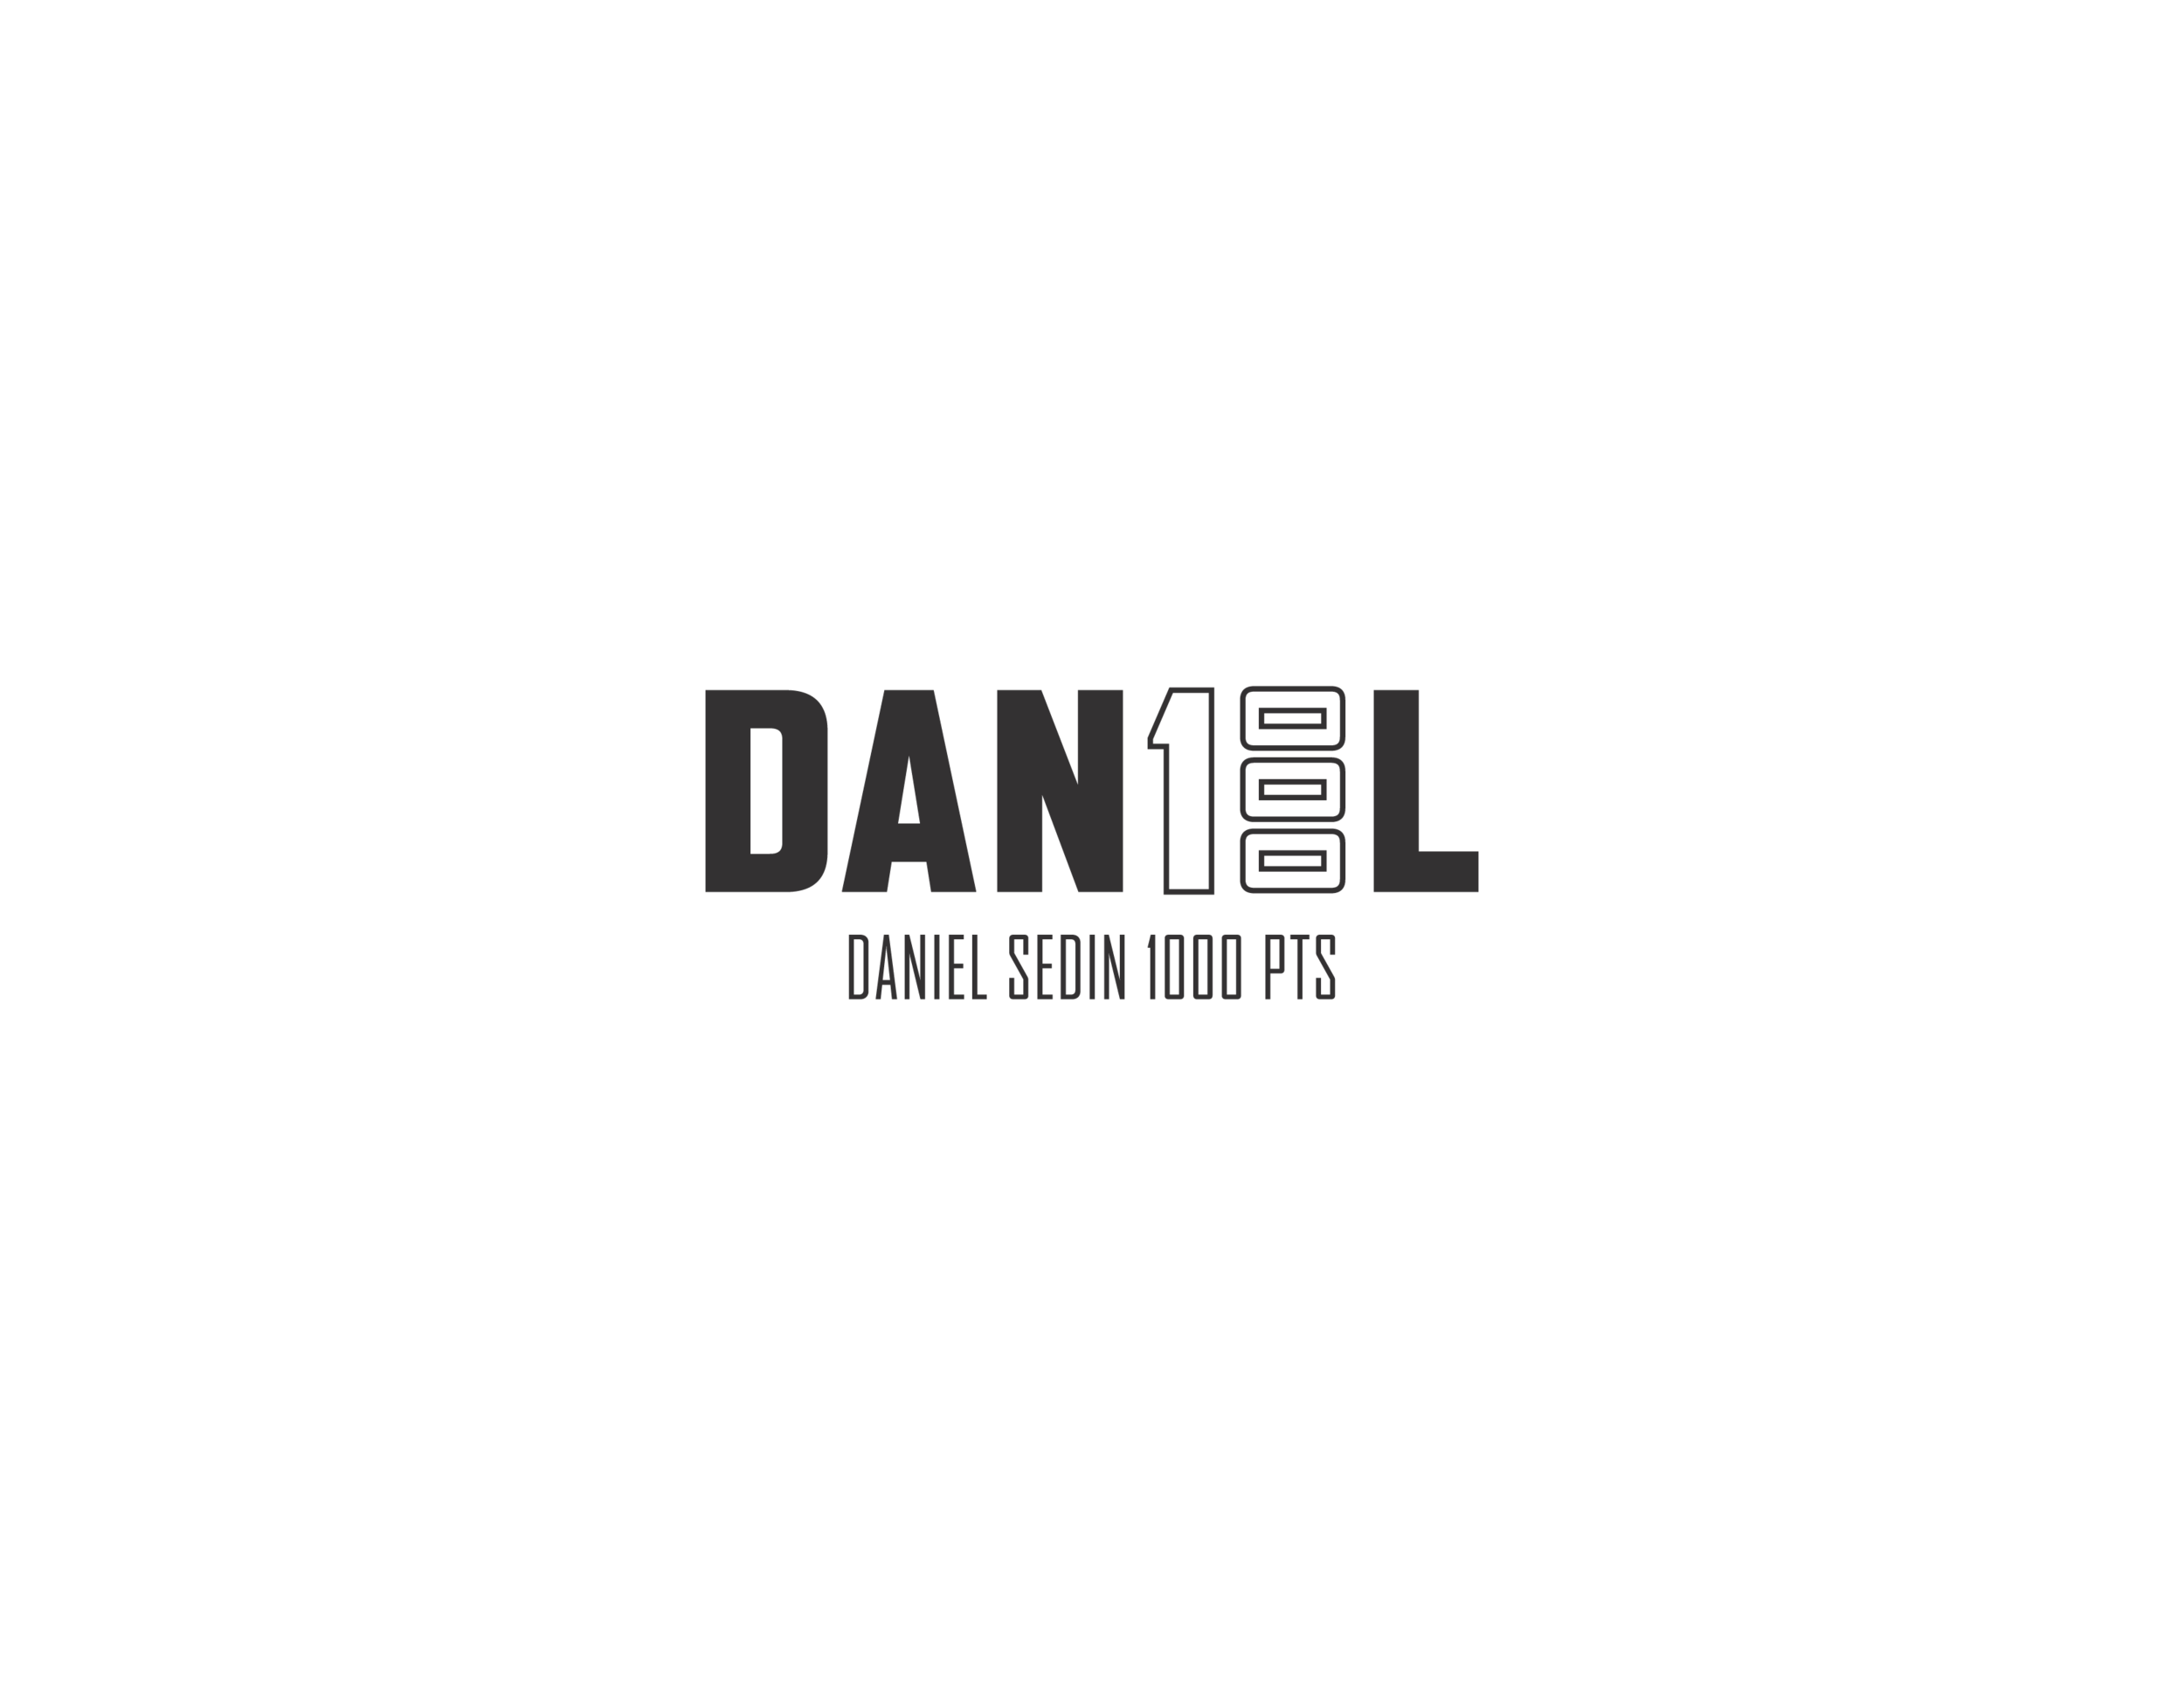 Henrik&Daniel1000-Wordmarks-02.png